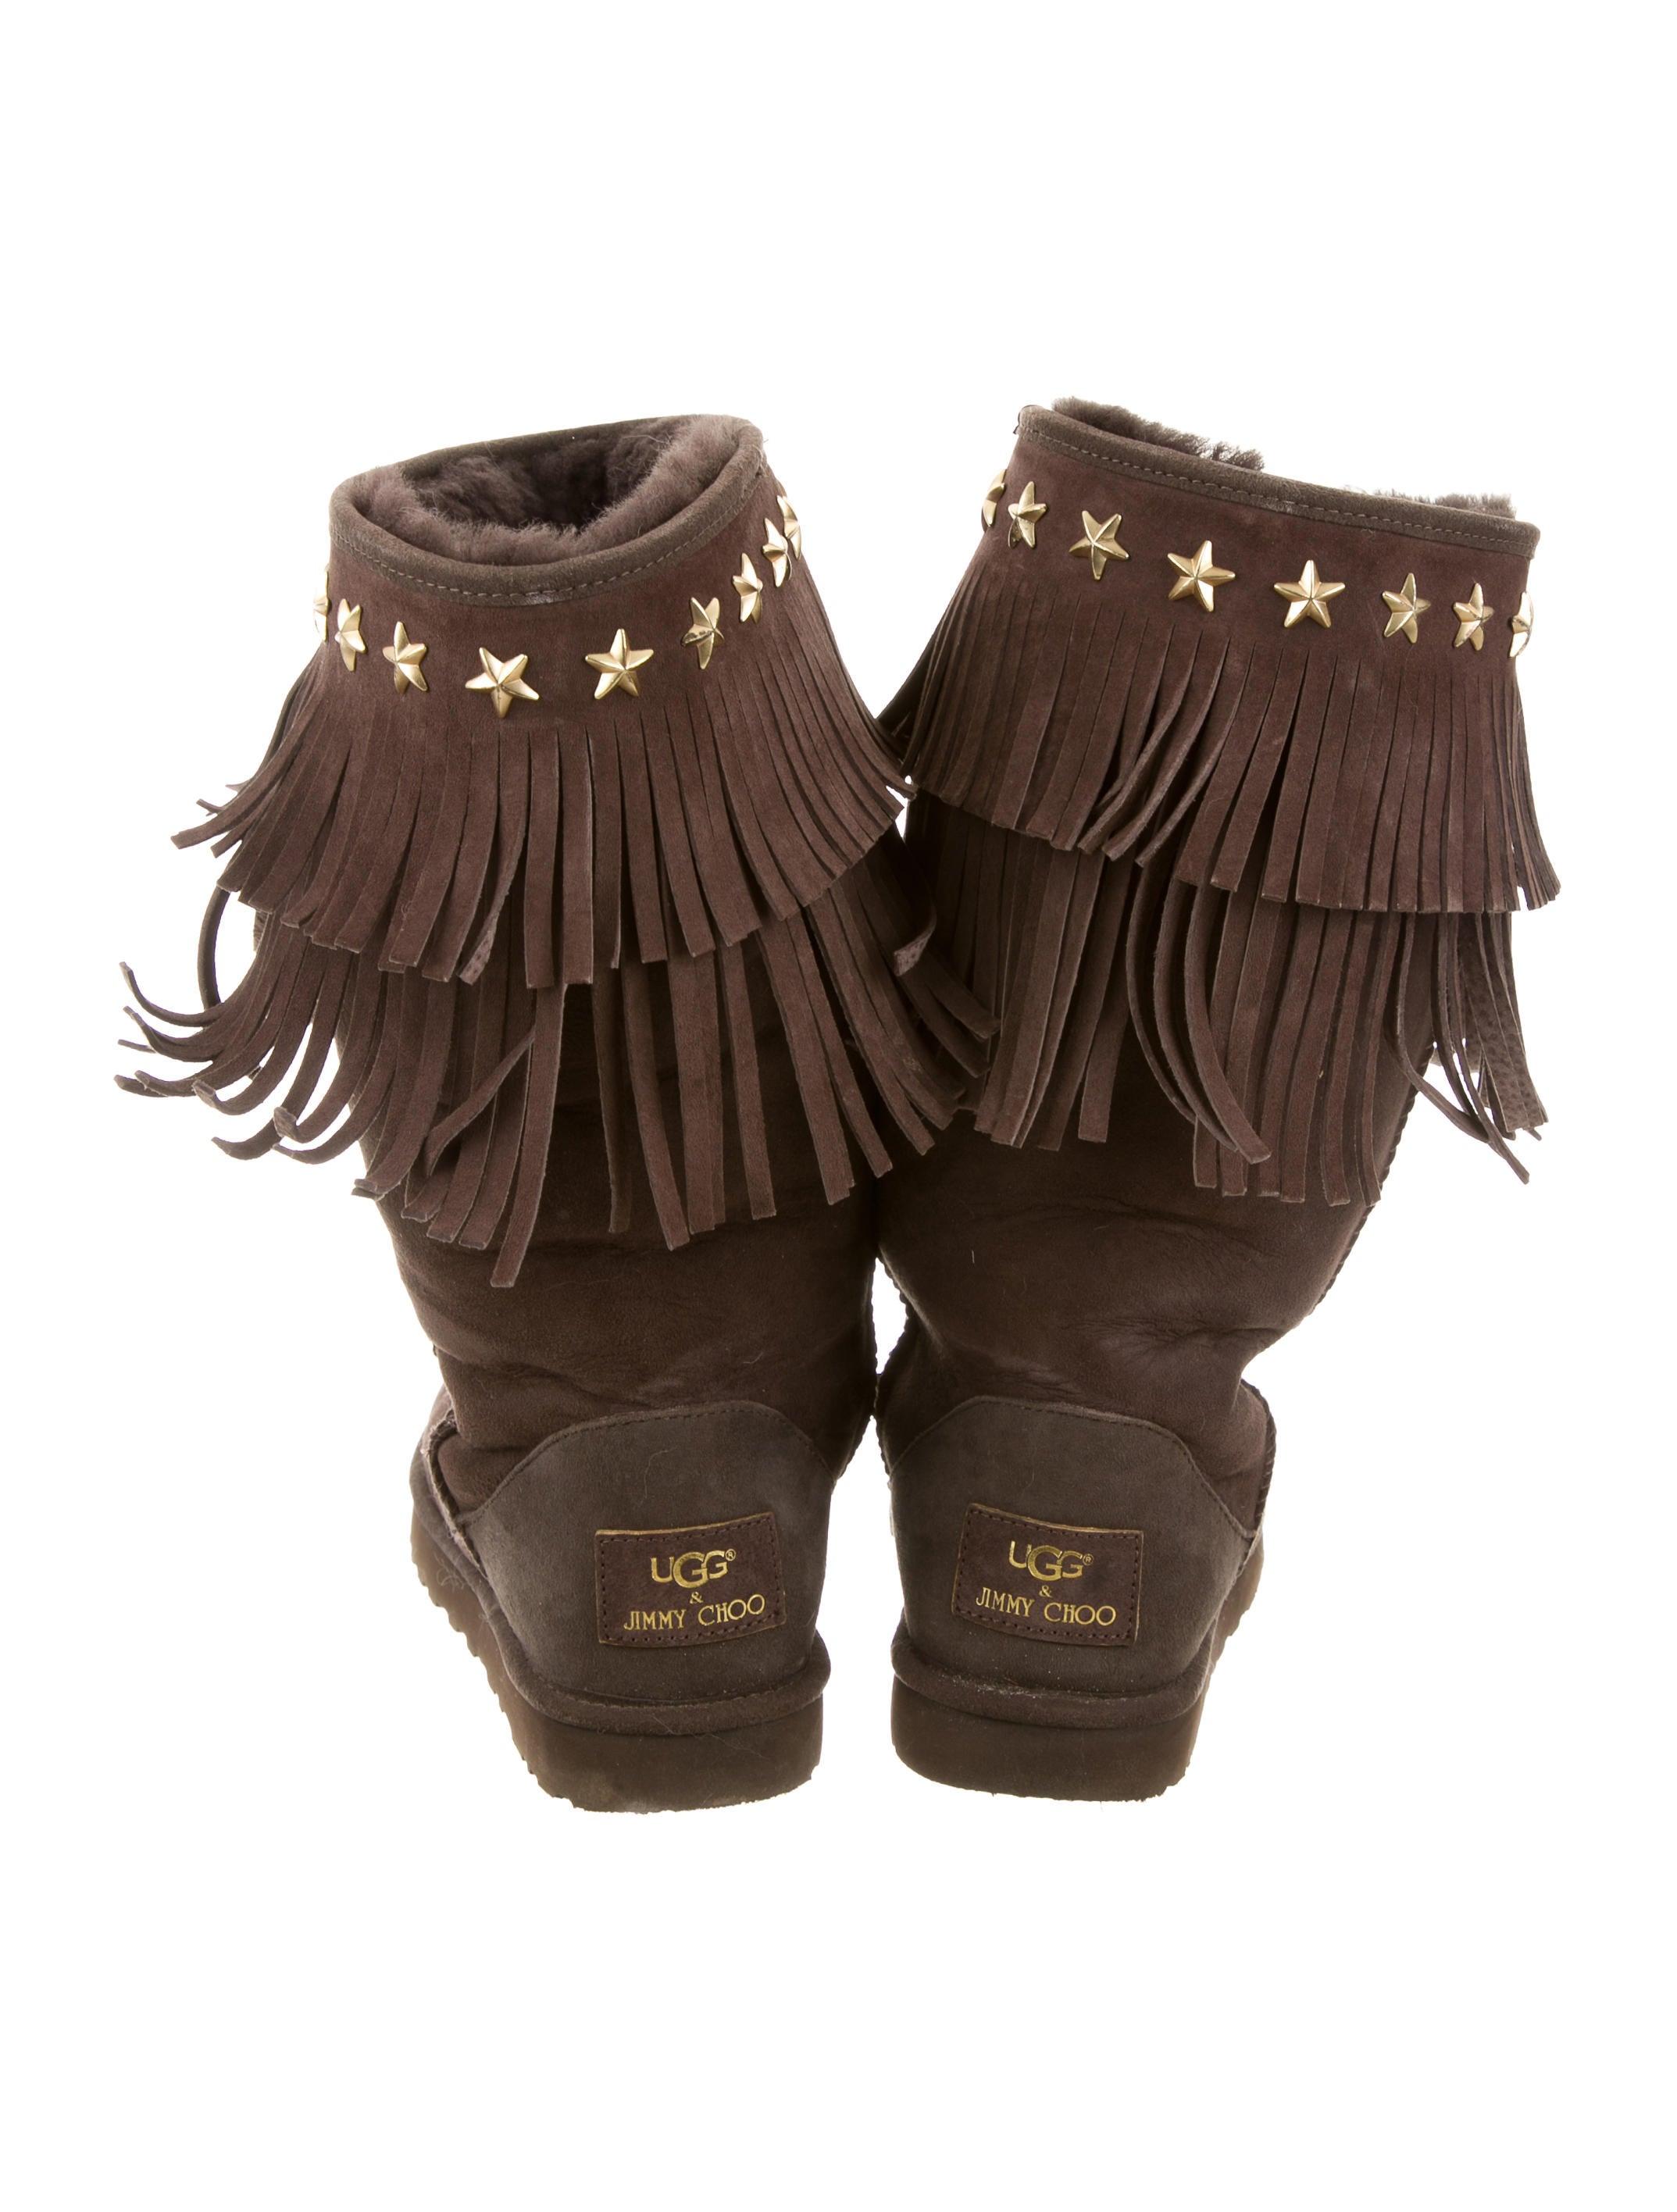 a528ab317f7 Jimmy Choo Clearance Sora Du Muy Ugg Boots Ville 7Rvww8q